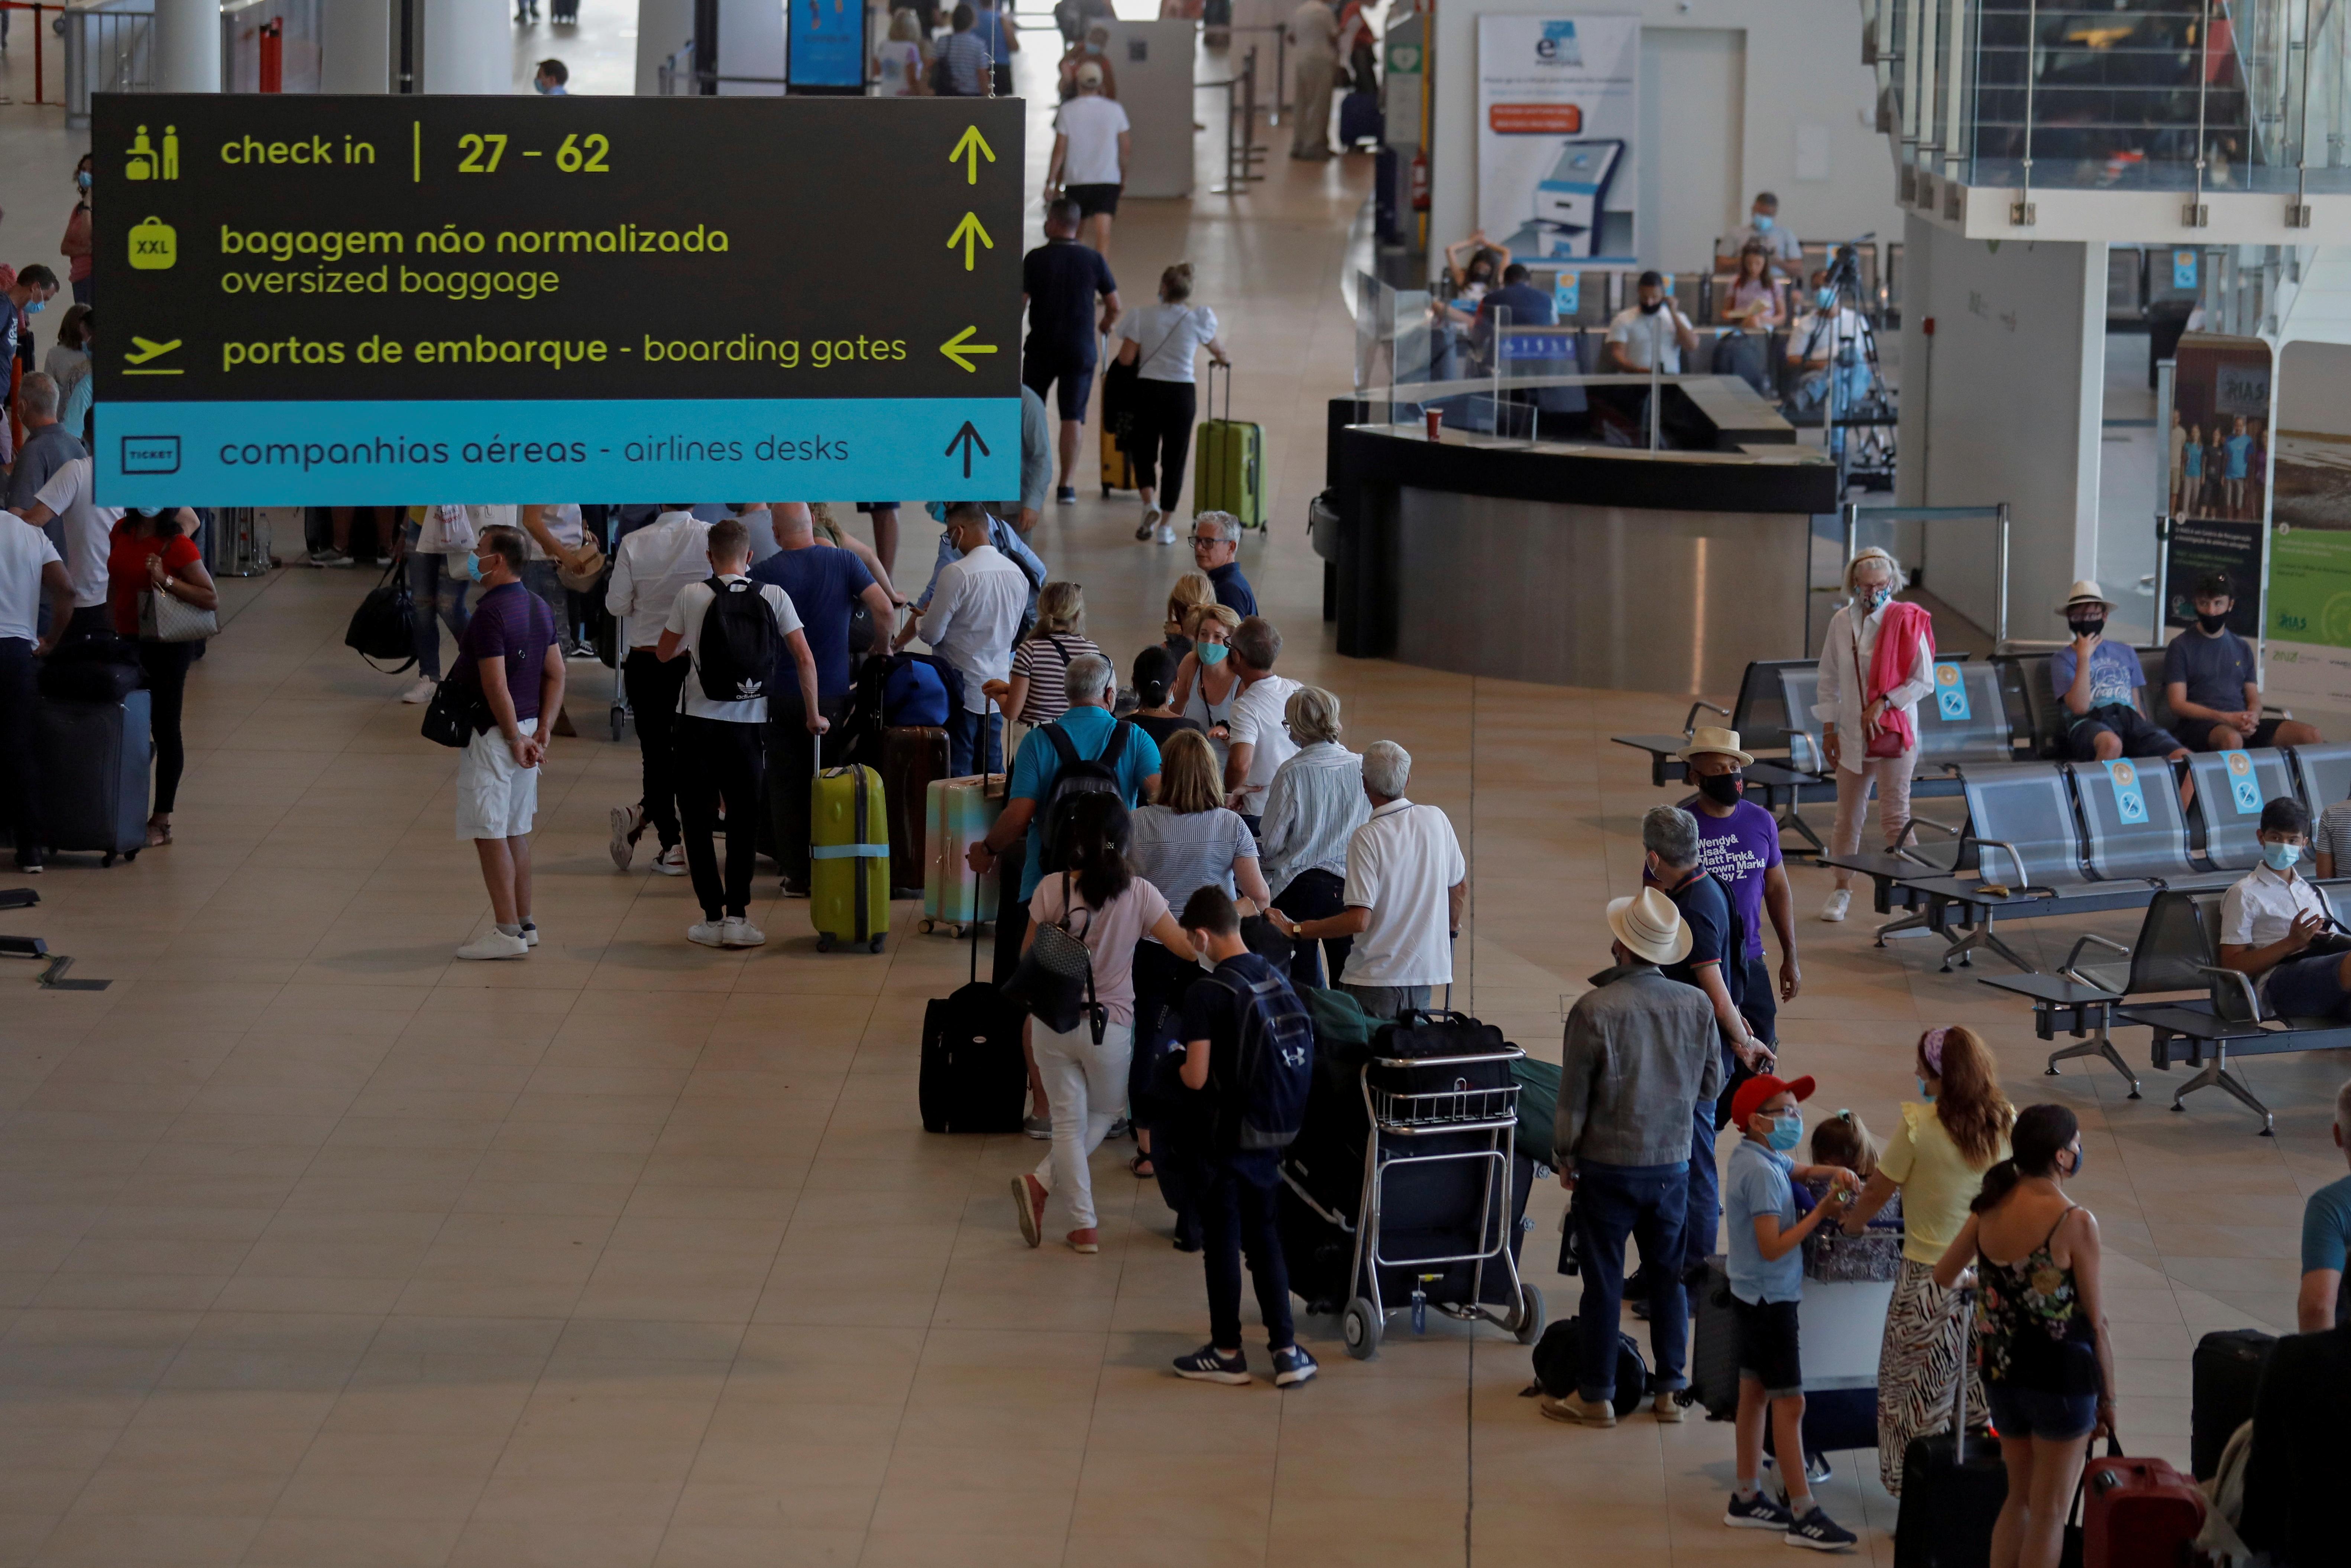 People wait in queues at Faro airport amid the coronavirus disease (COVID-19) pandemic, in Faro